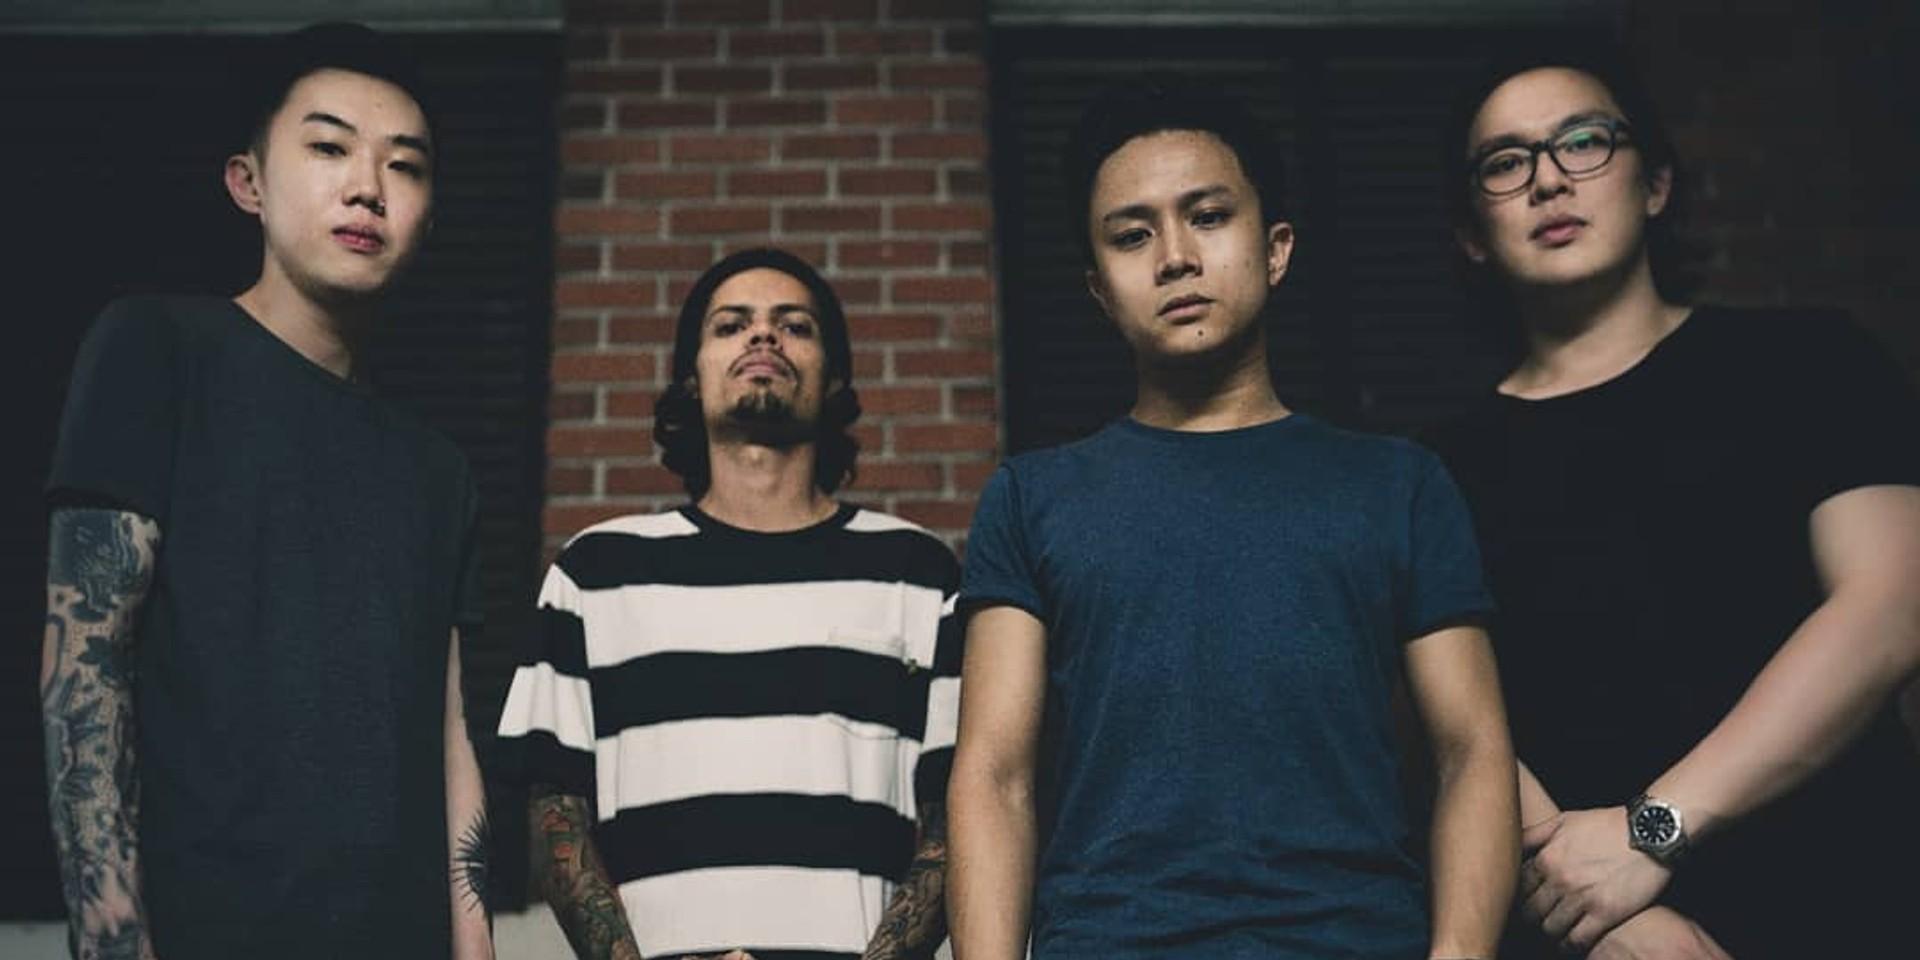 Sun Eater release new song 'Patriot' – listen